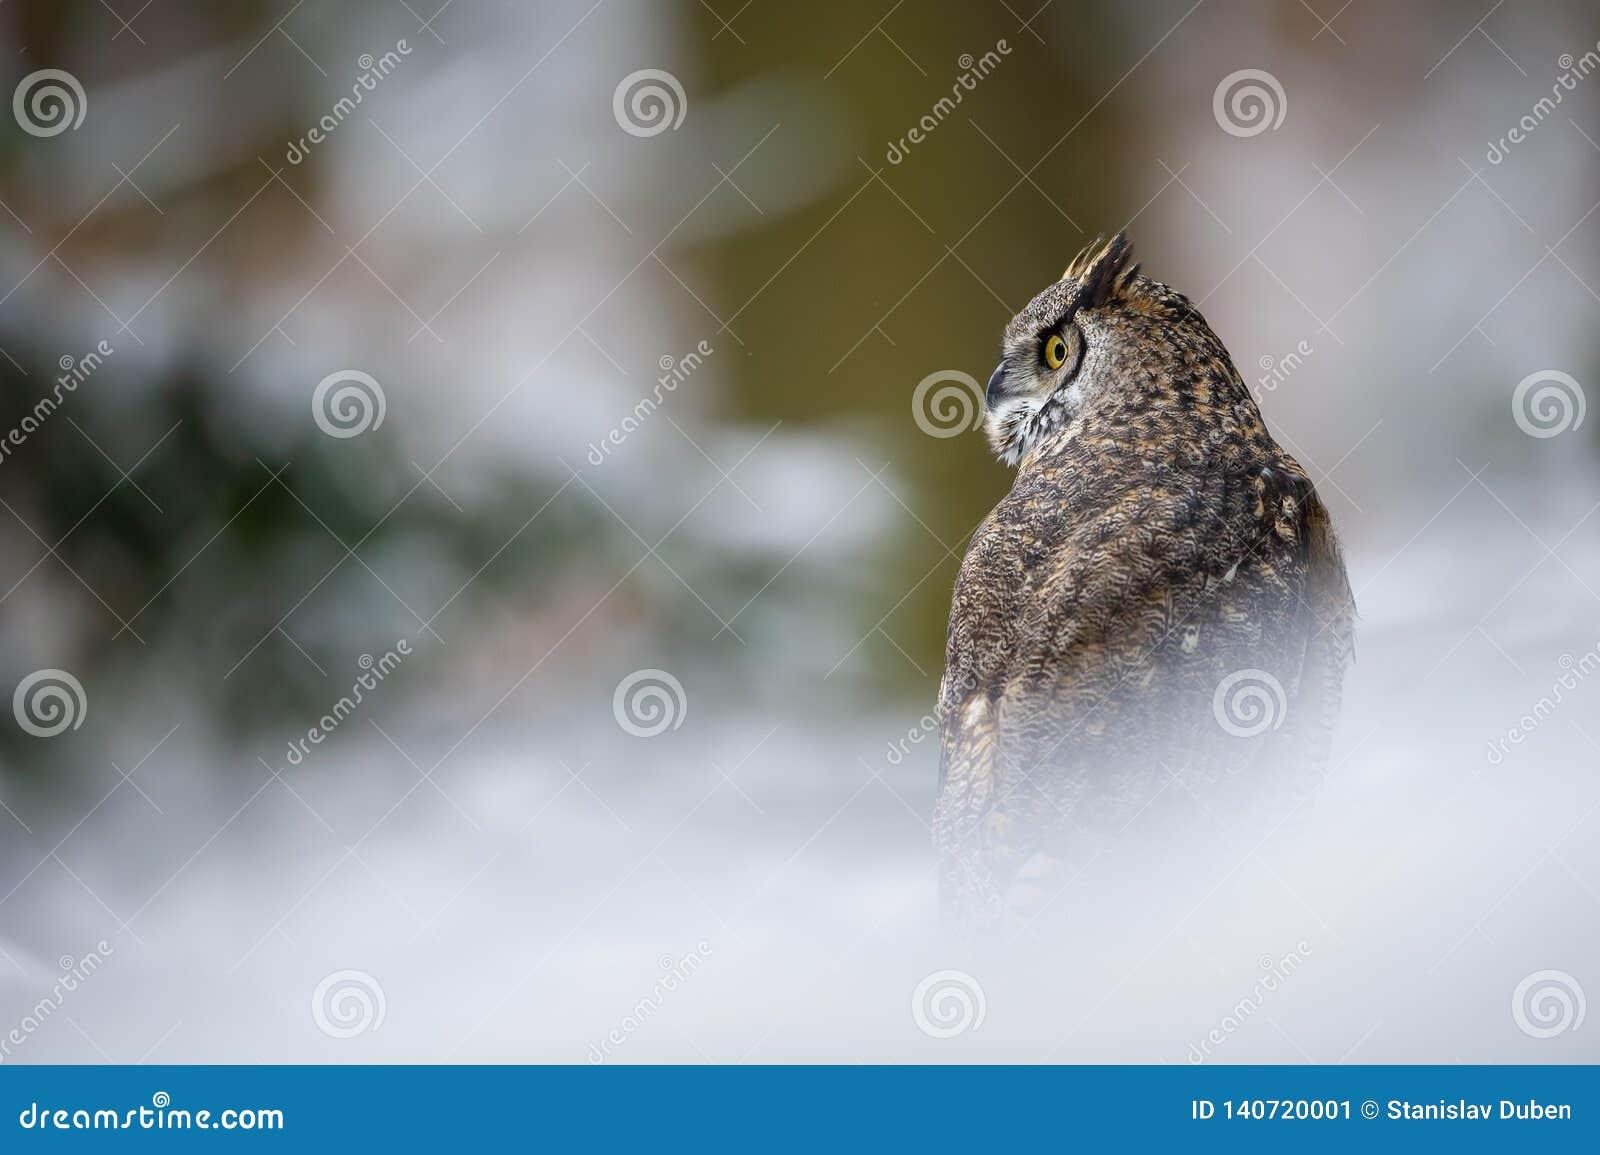 Tiger owl - Great horned owl - Hoot owl